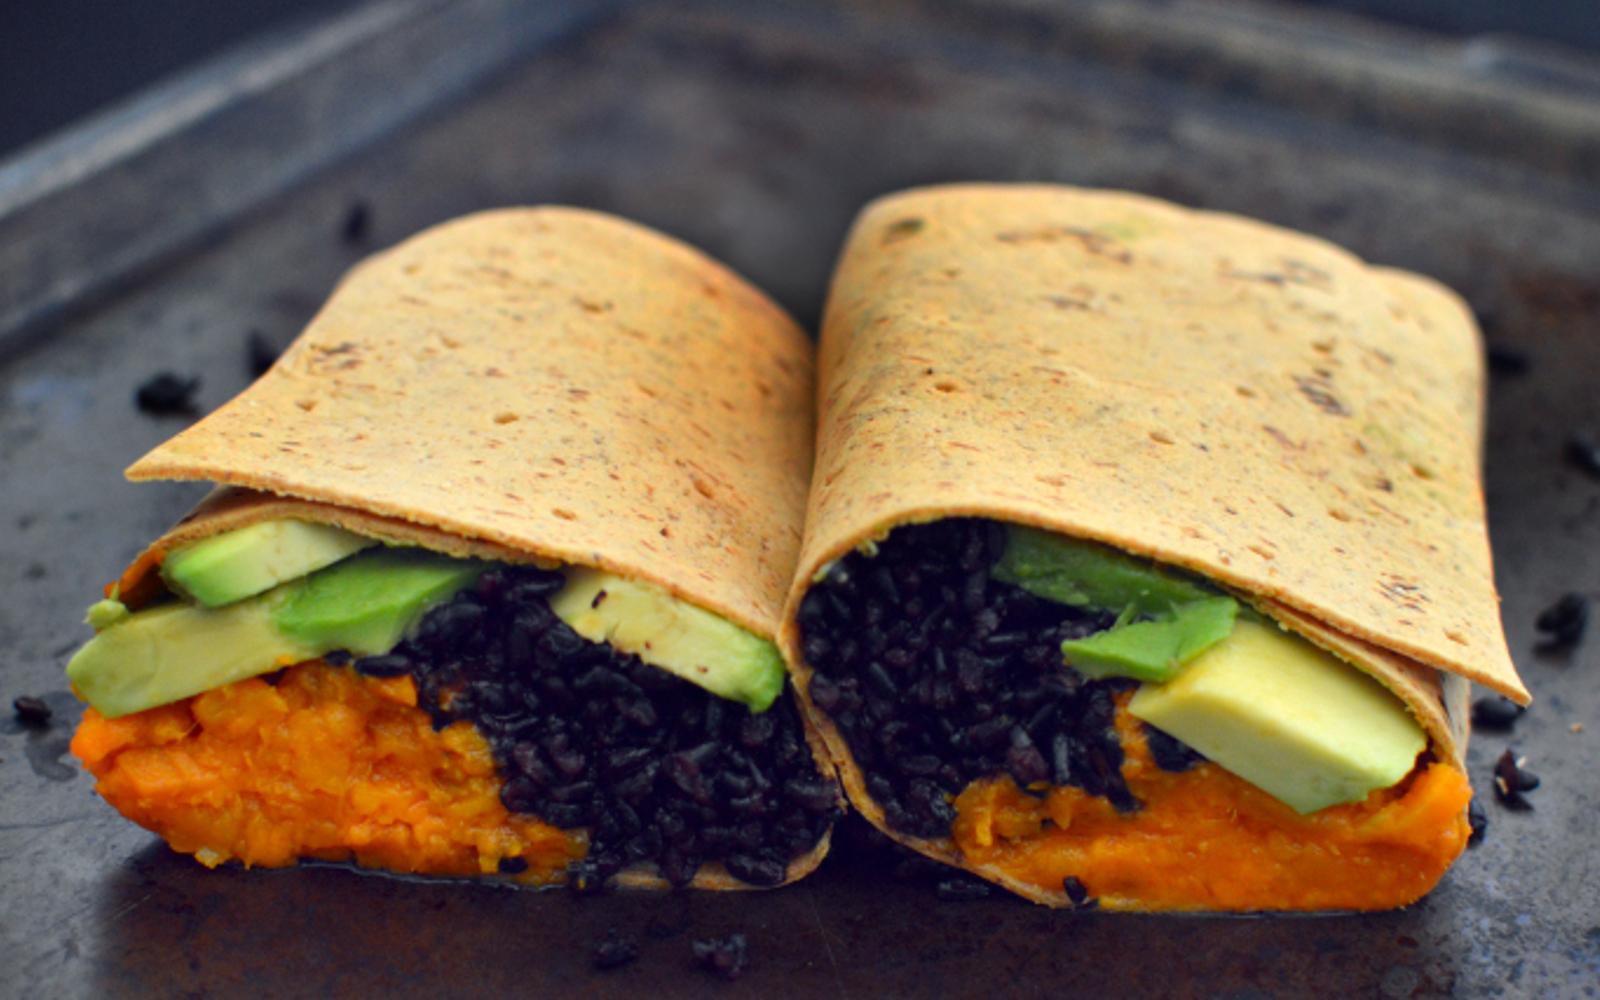 VEgan Buffalo Sweet Potato, Black Rice, and Avocado Wrap